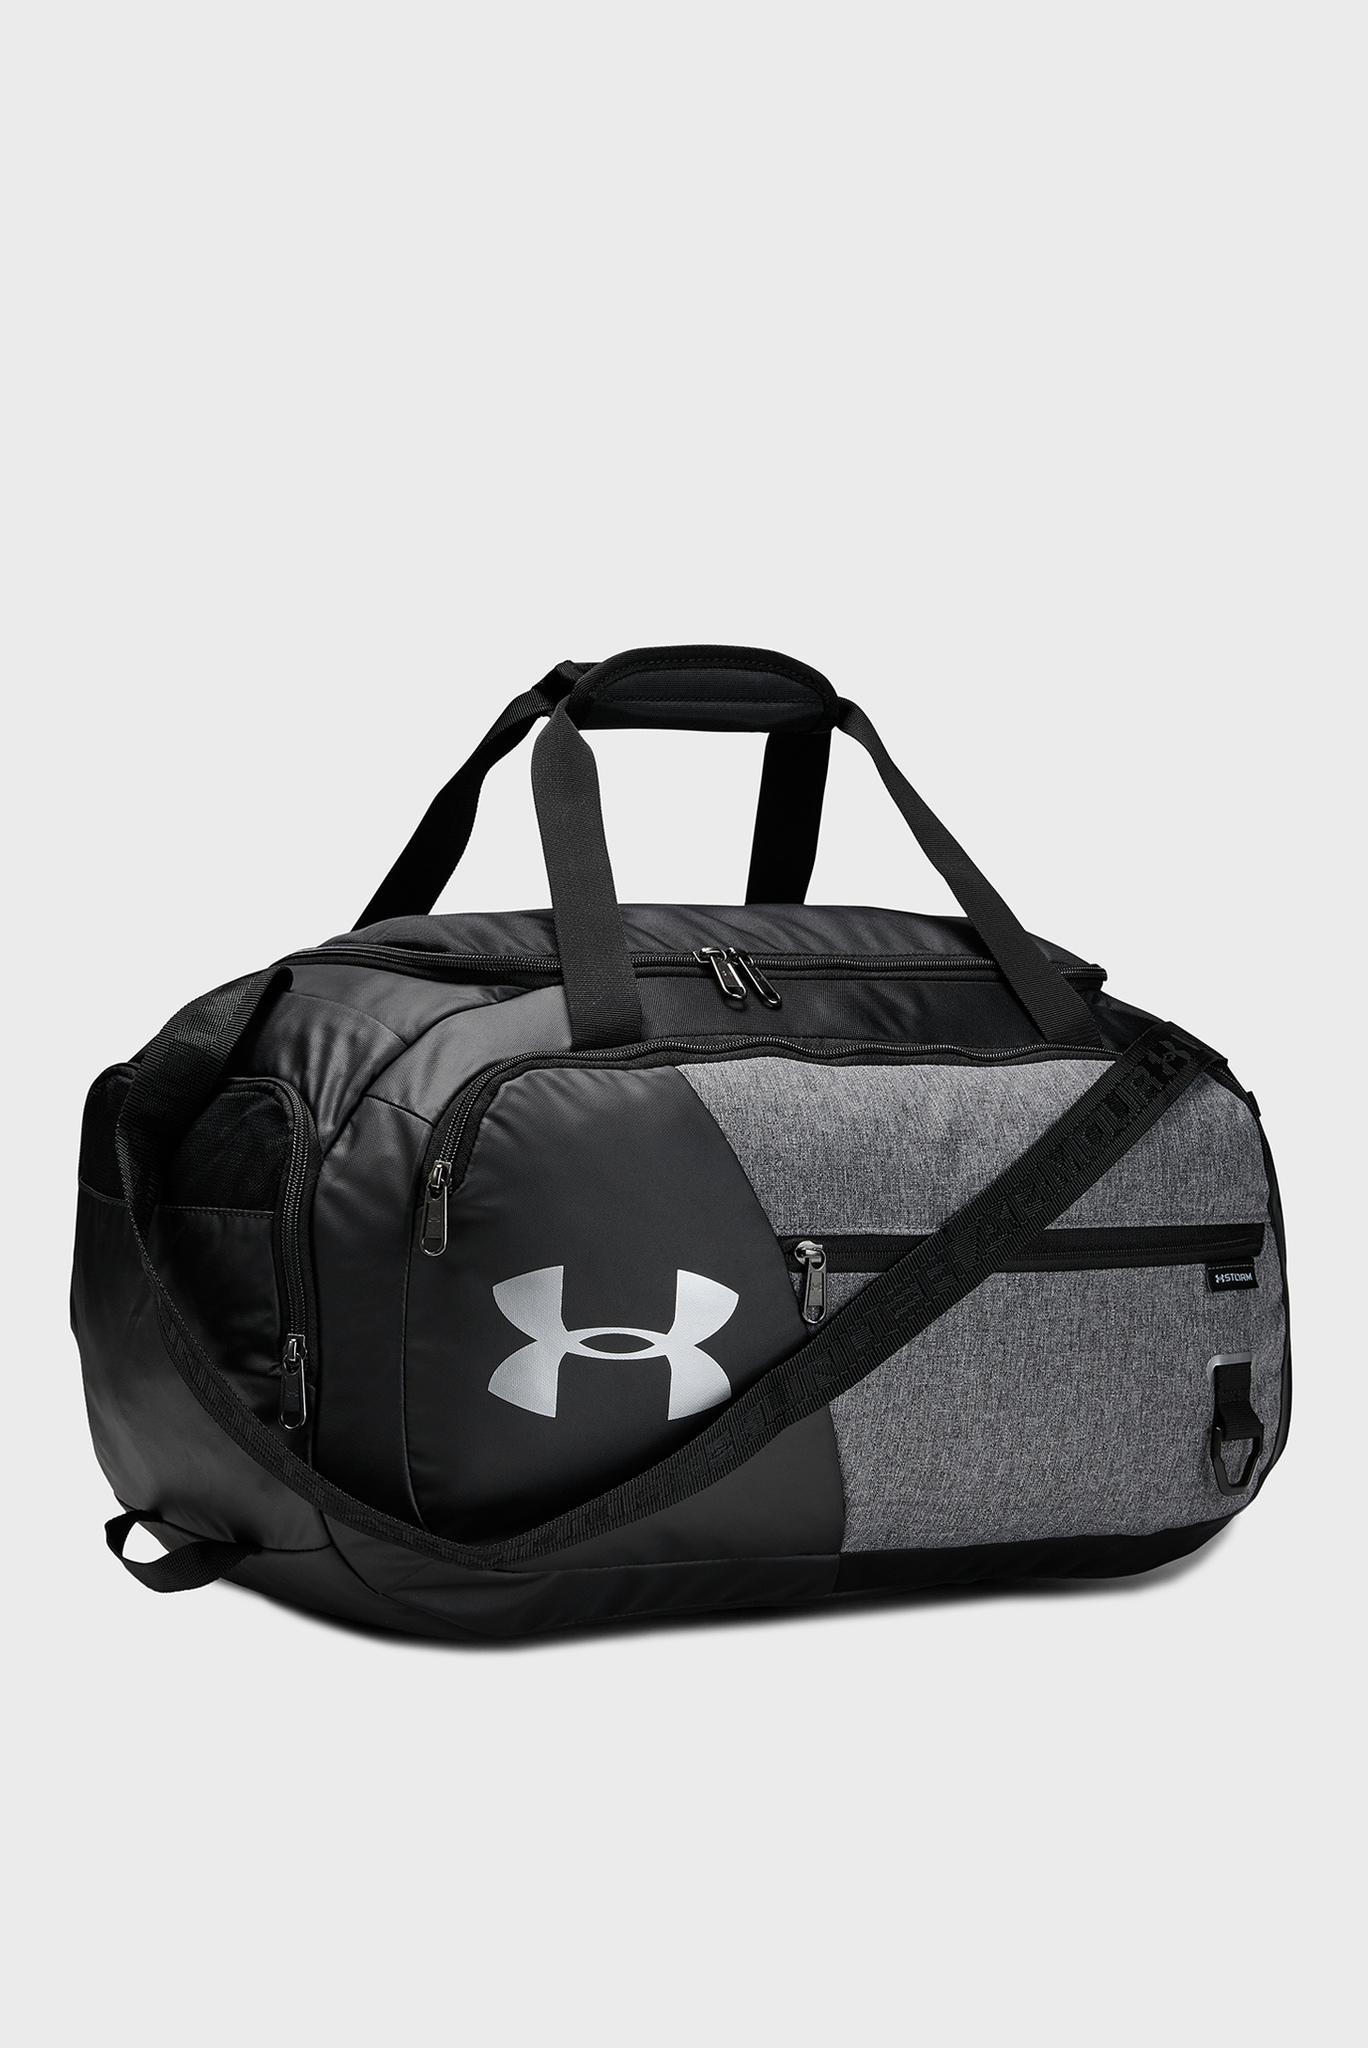 Серая спортивная сумка Undeniable Duffel 4.0 SM Under Armour